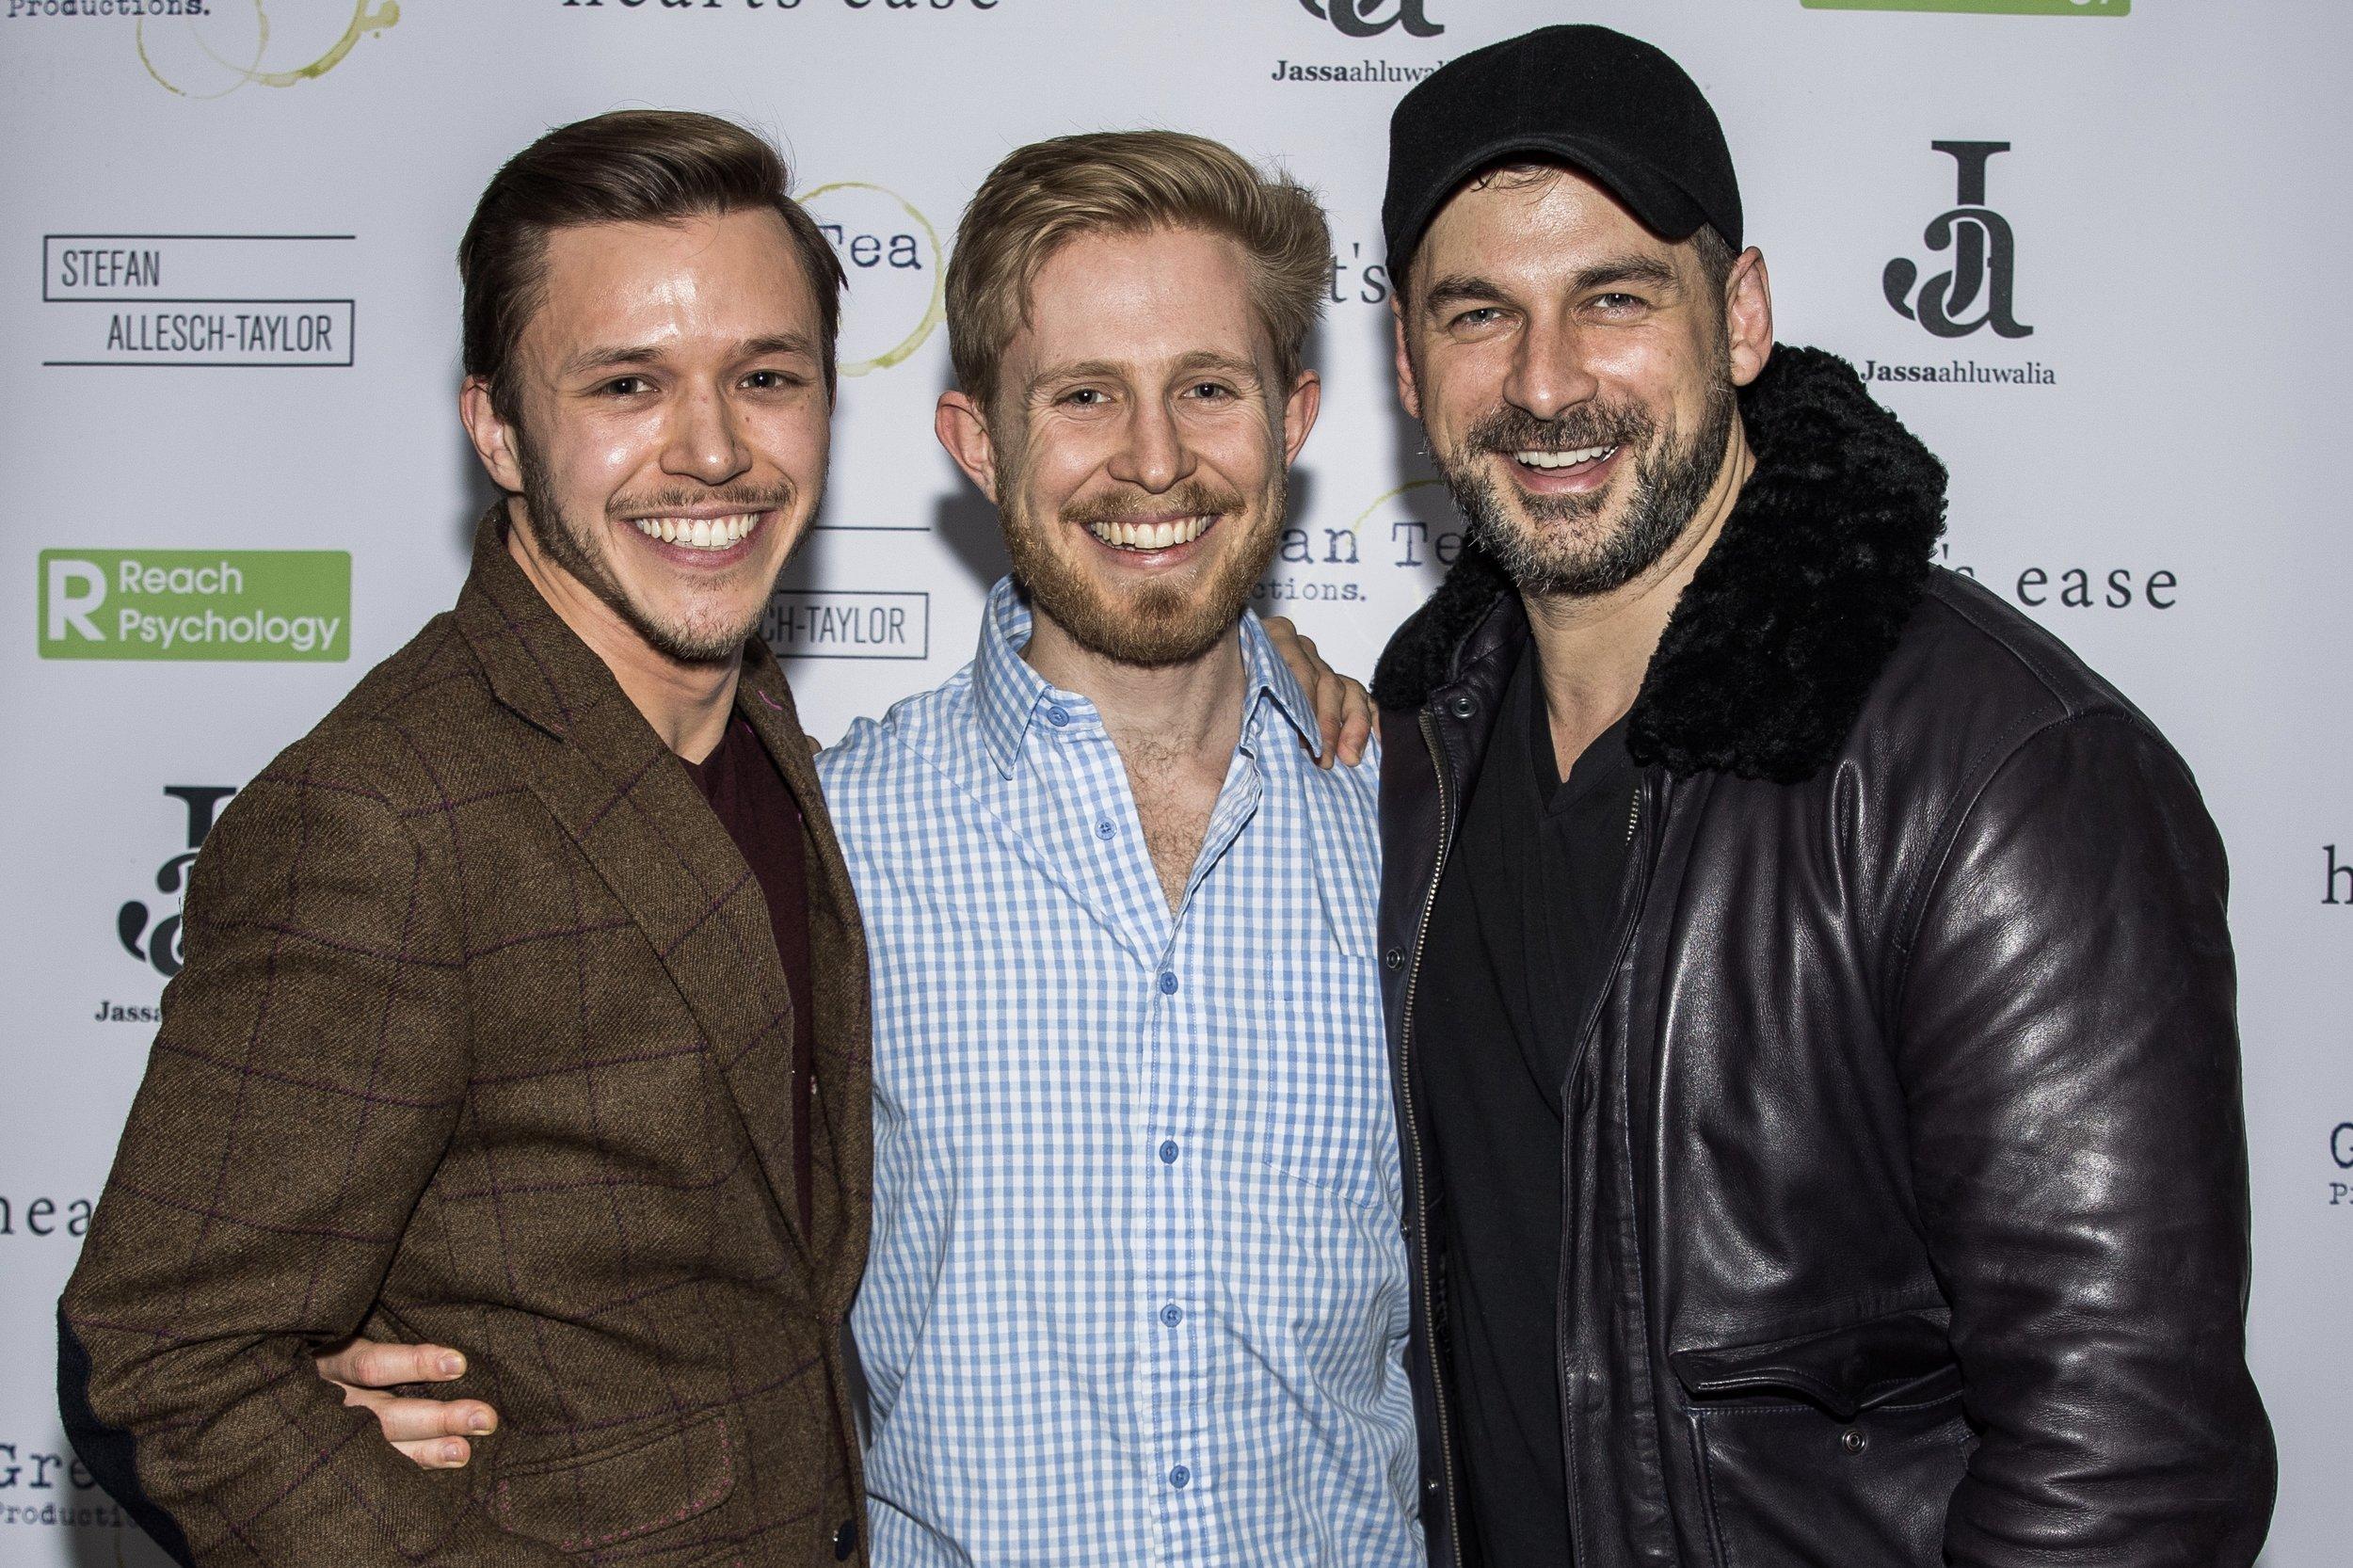 Jassa Ahluwalia, Sebastian Solberg and Cristian Solimeno attend the cast and crew screening of Heart's Ease.